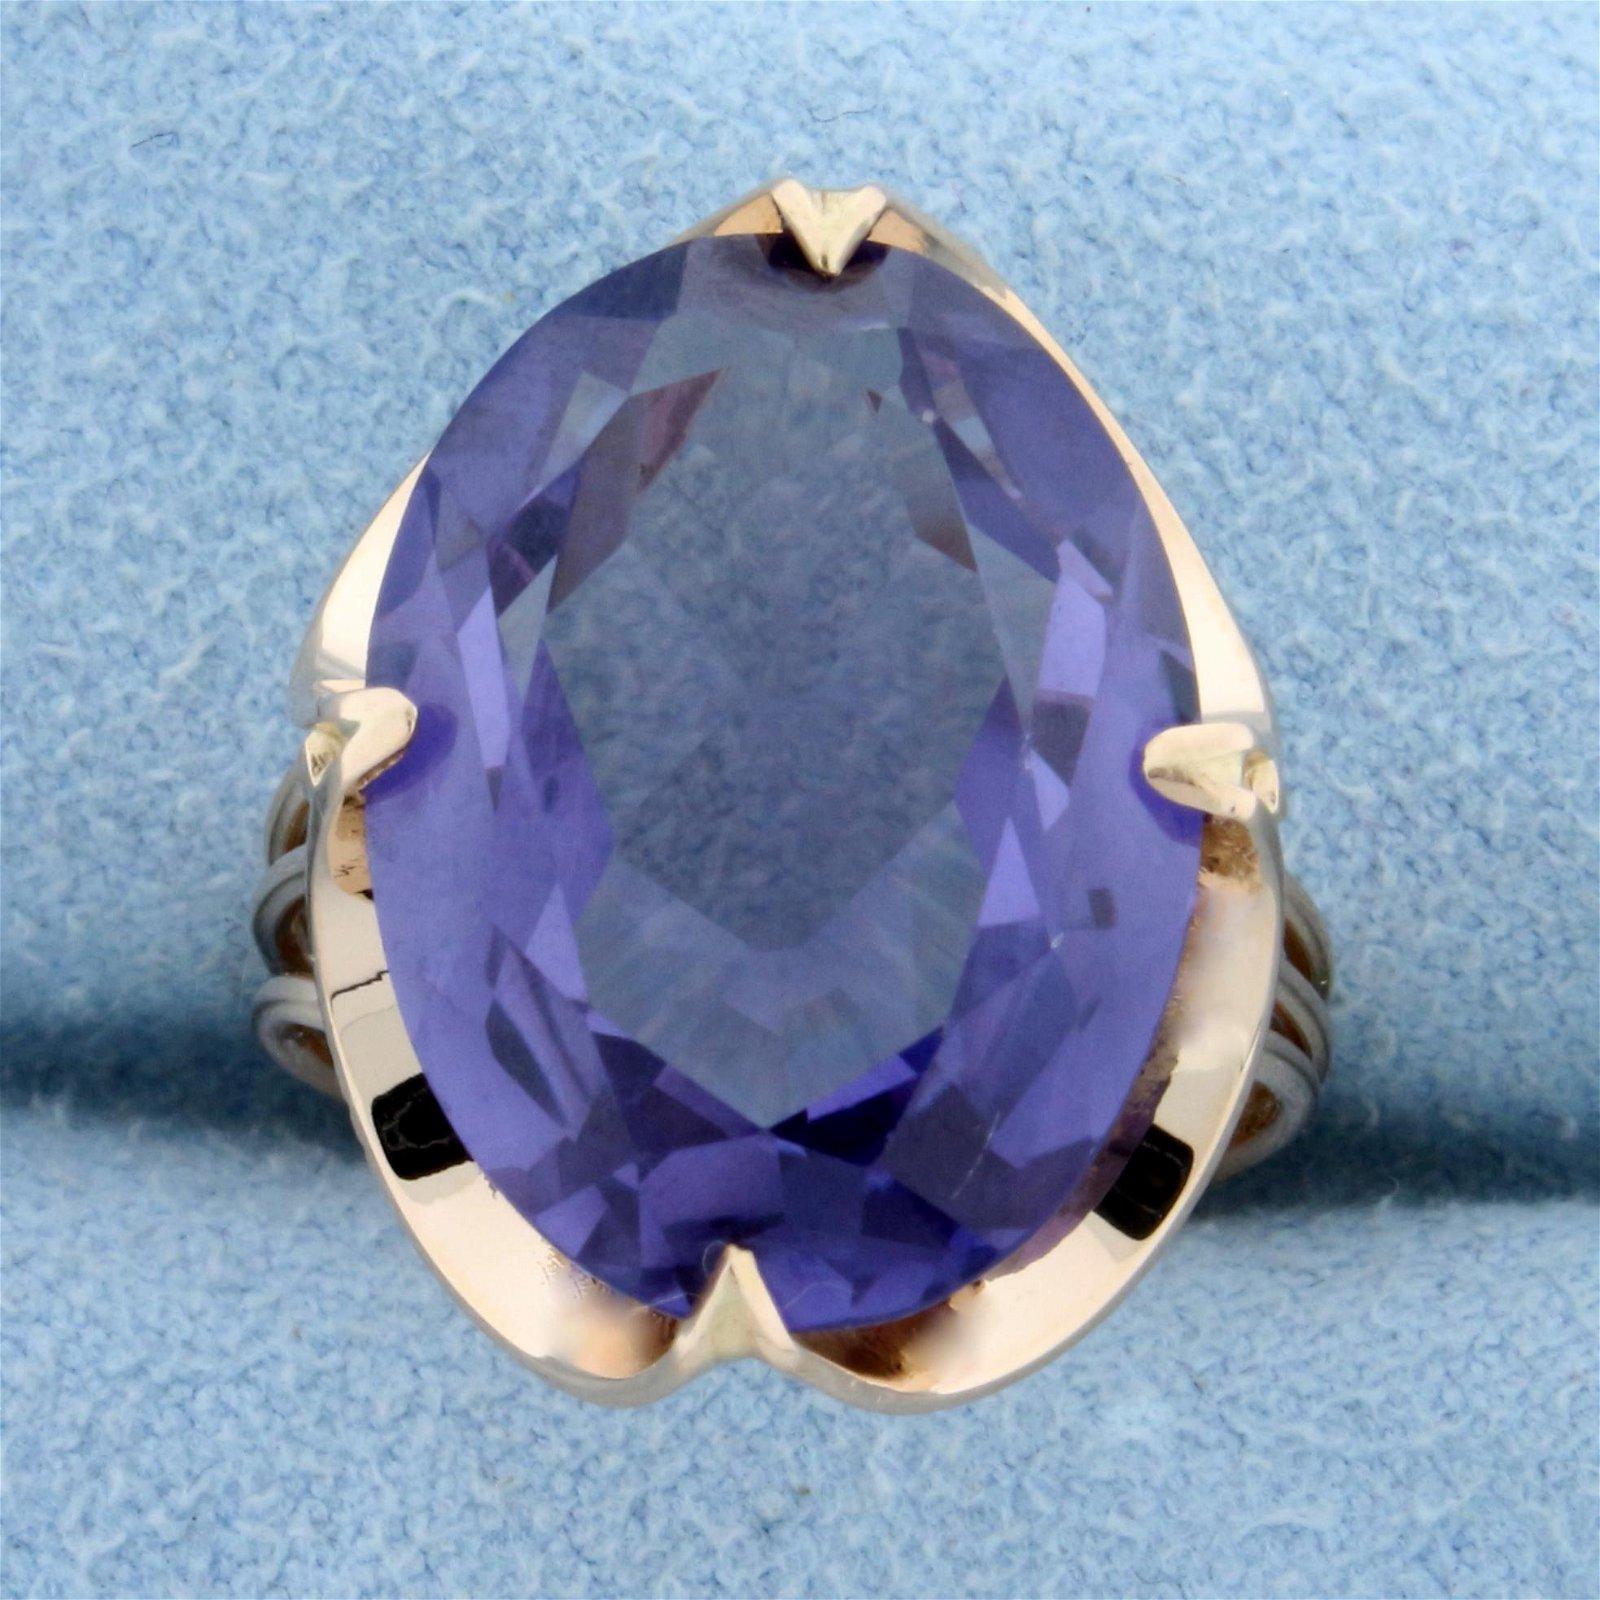 Vintage Large 15ct Purple Sapphire Ring in 14K Rose